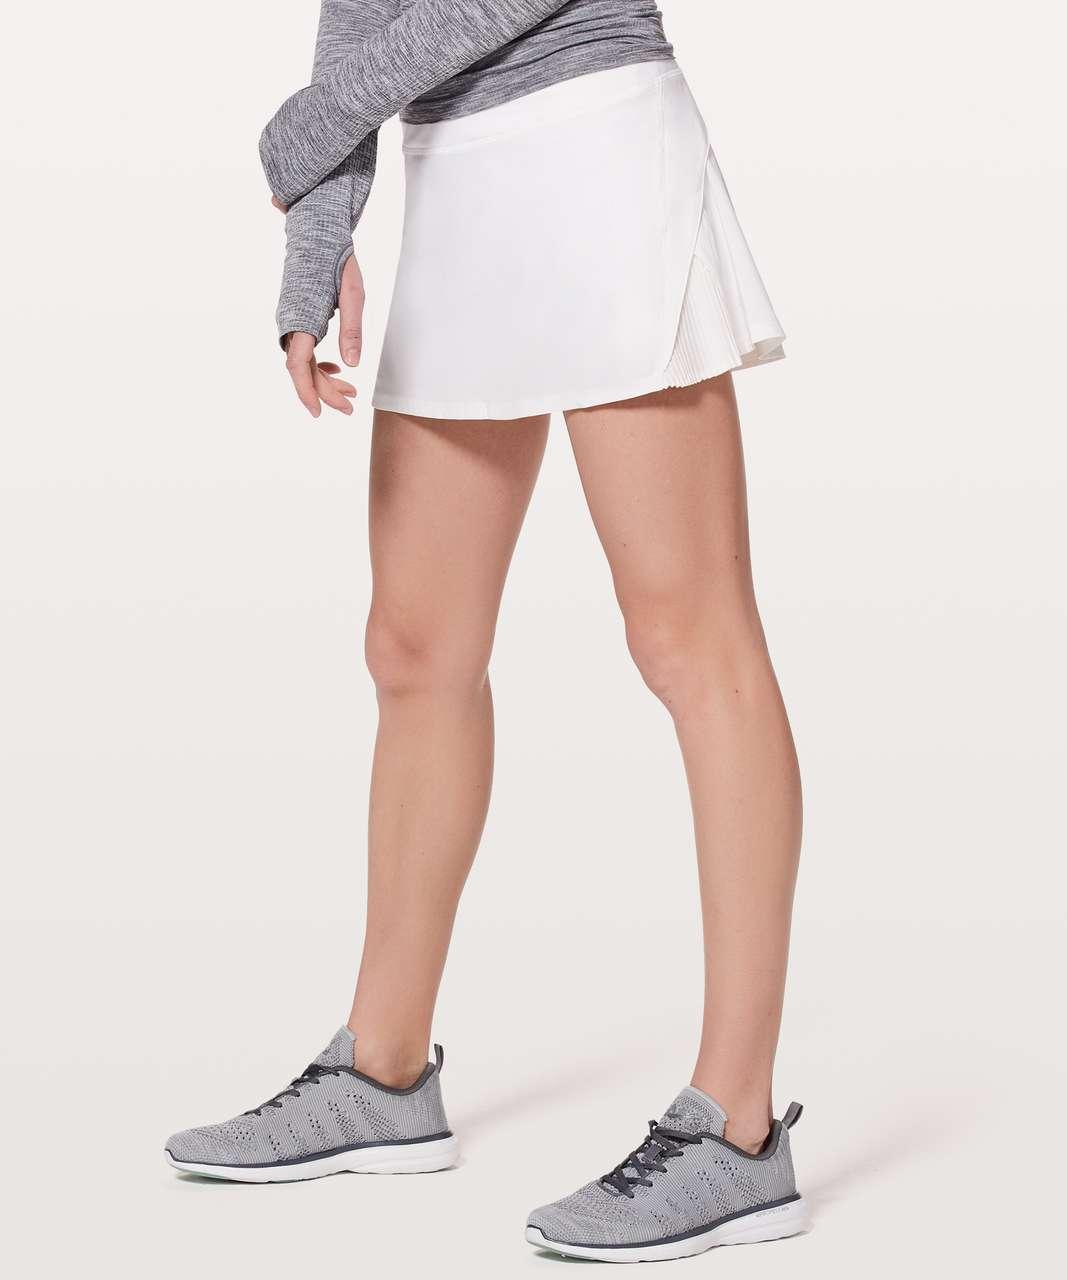 Lululemon Play Off The Pleats Skirt - White